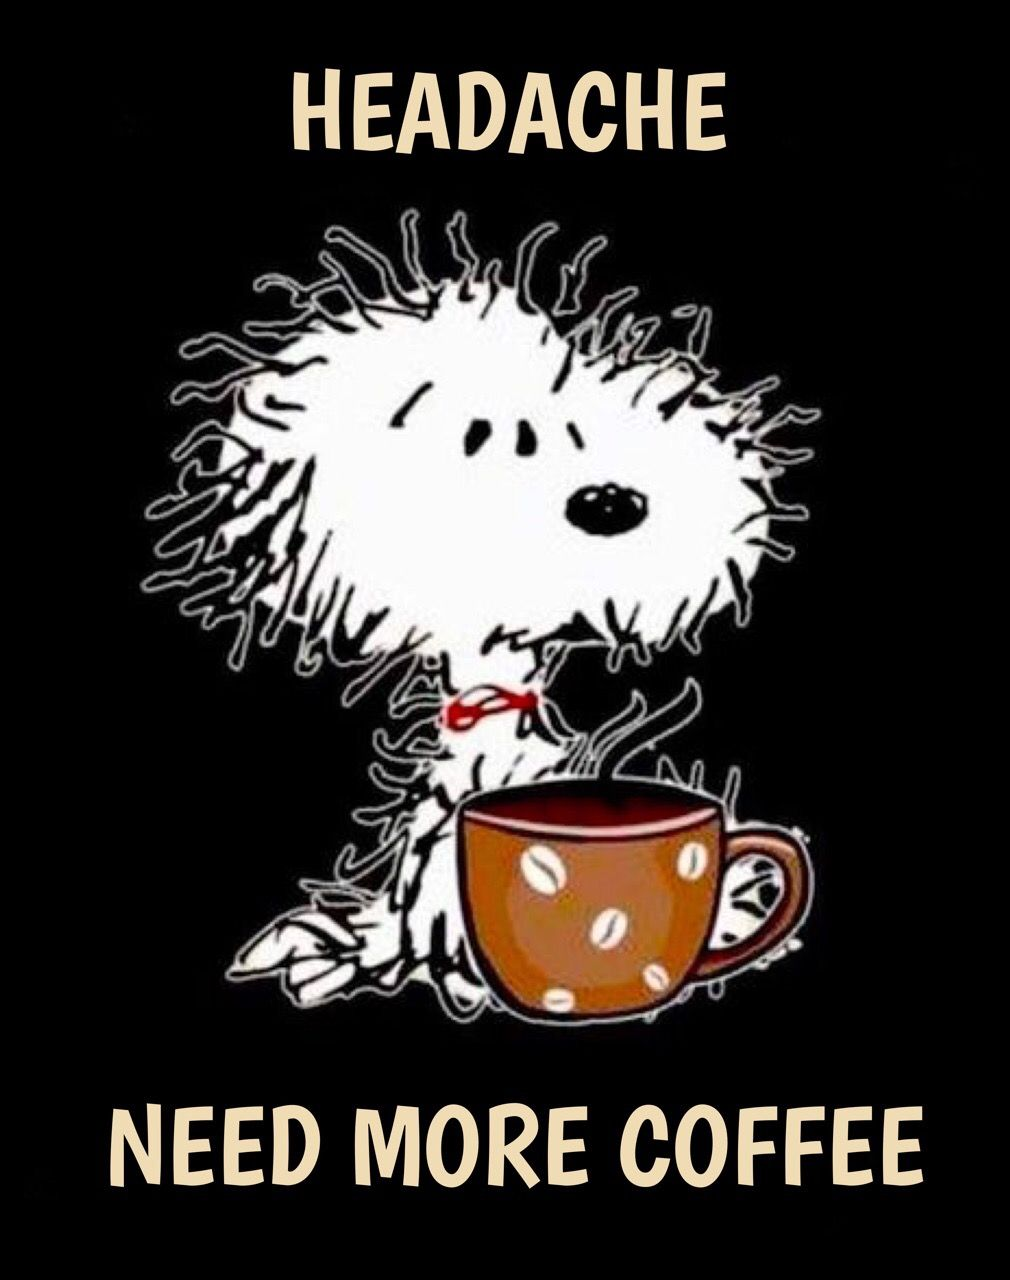 PEANUTS headache / coffee Snoopy funny, Snoopy